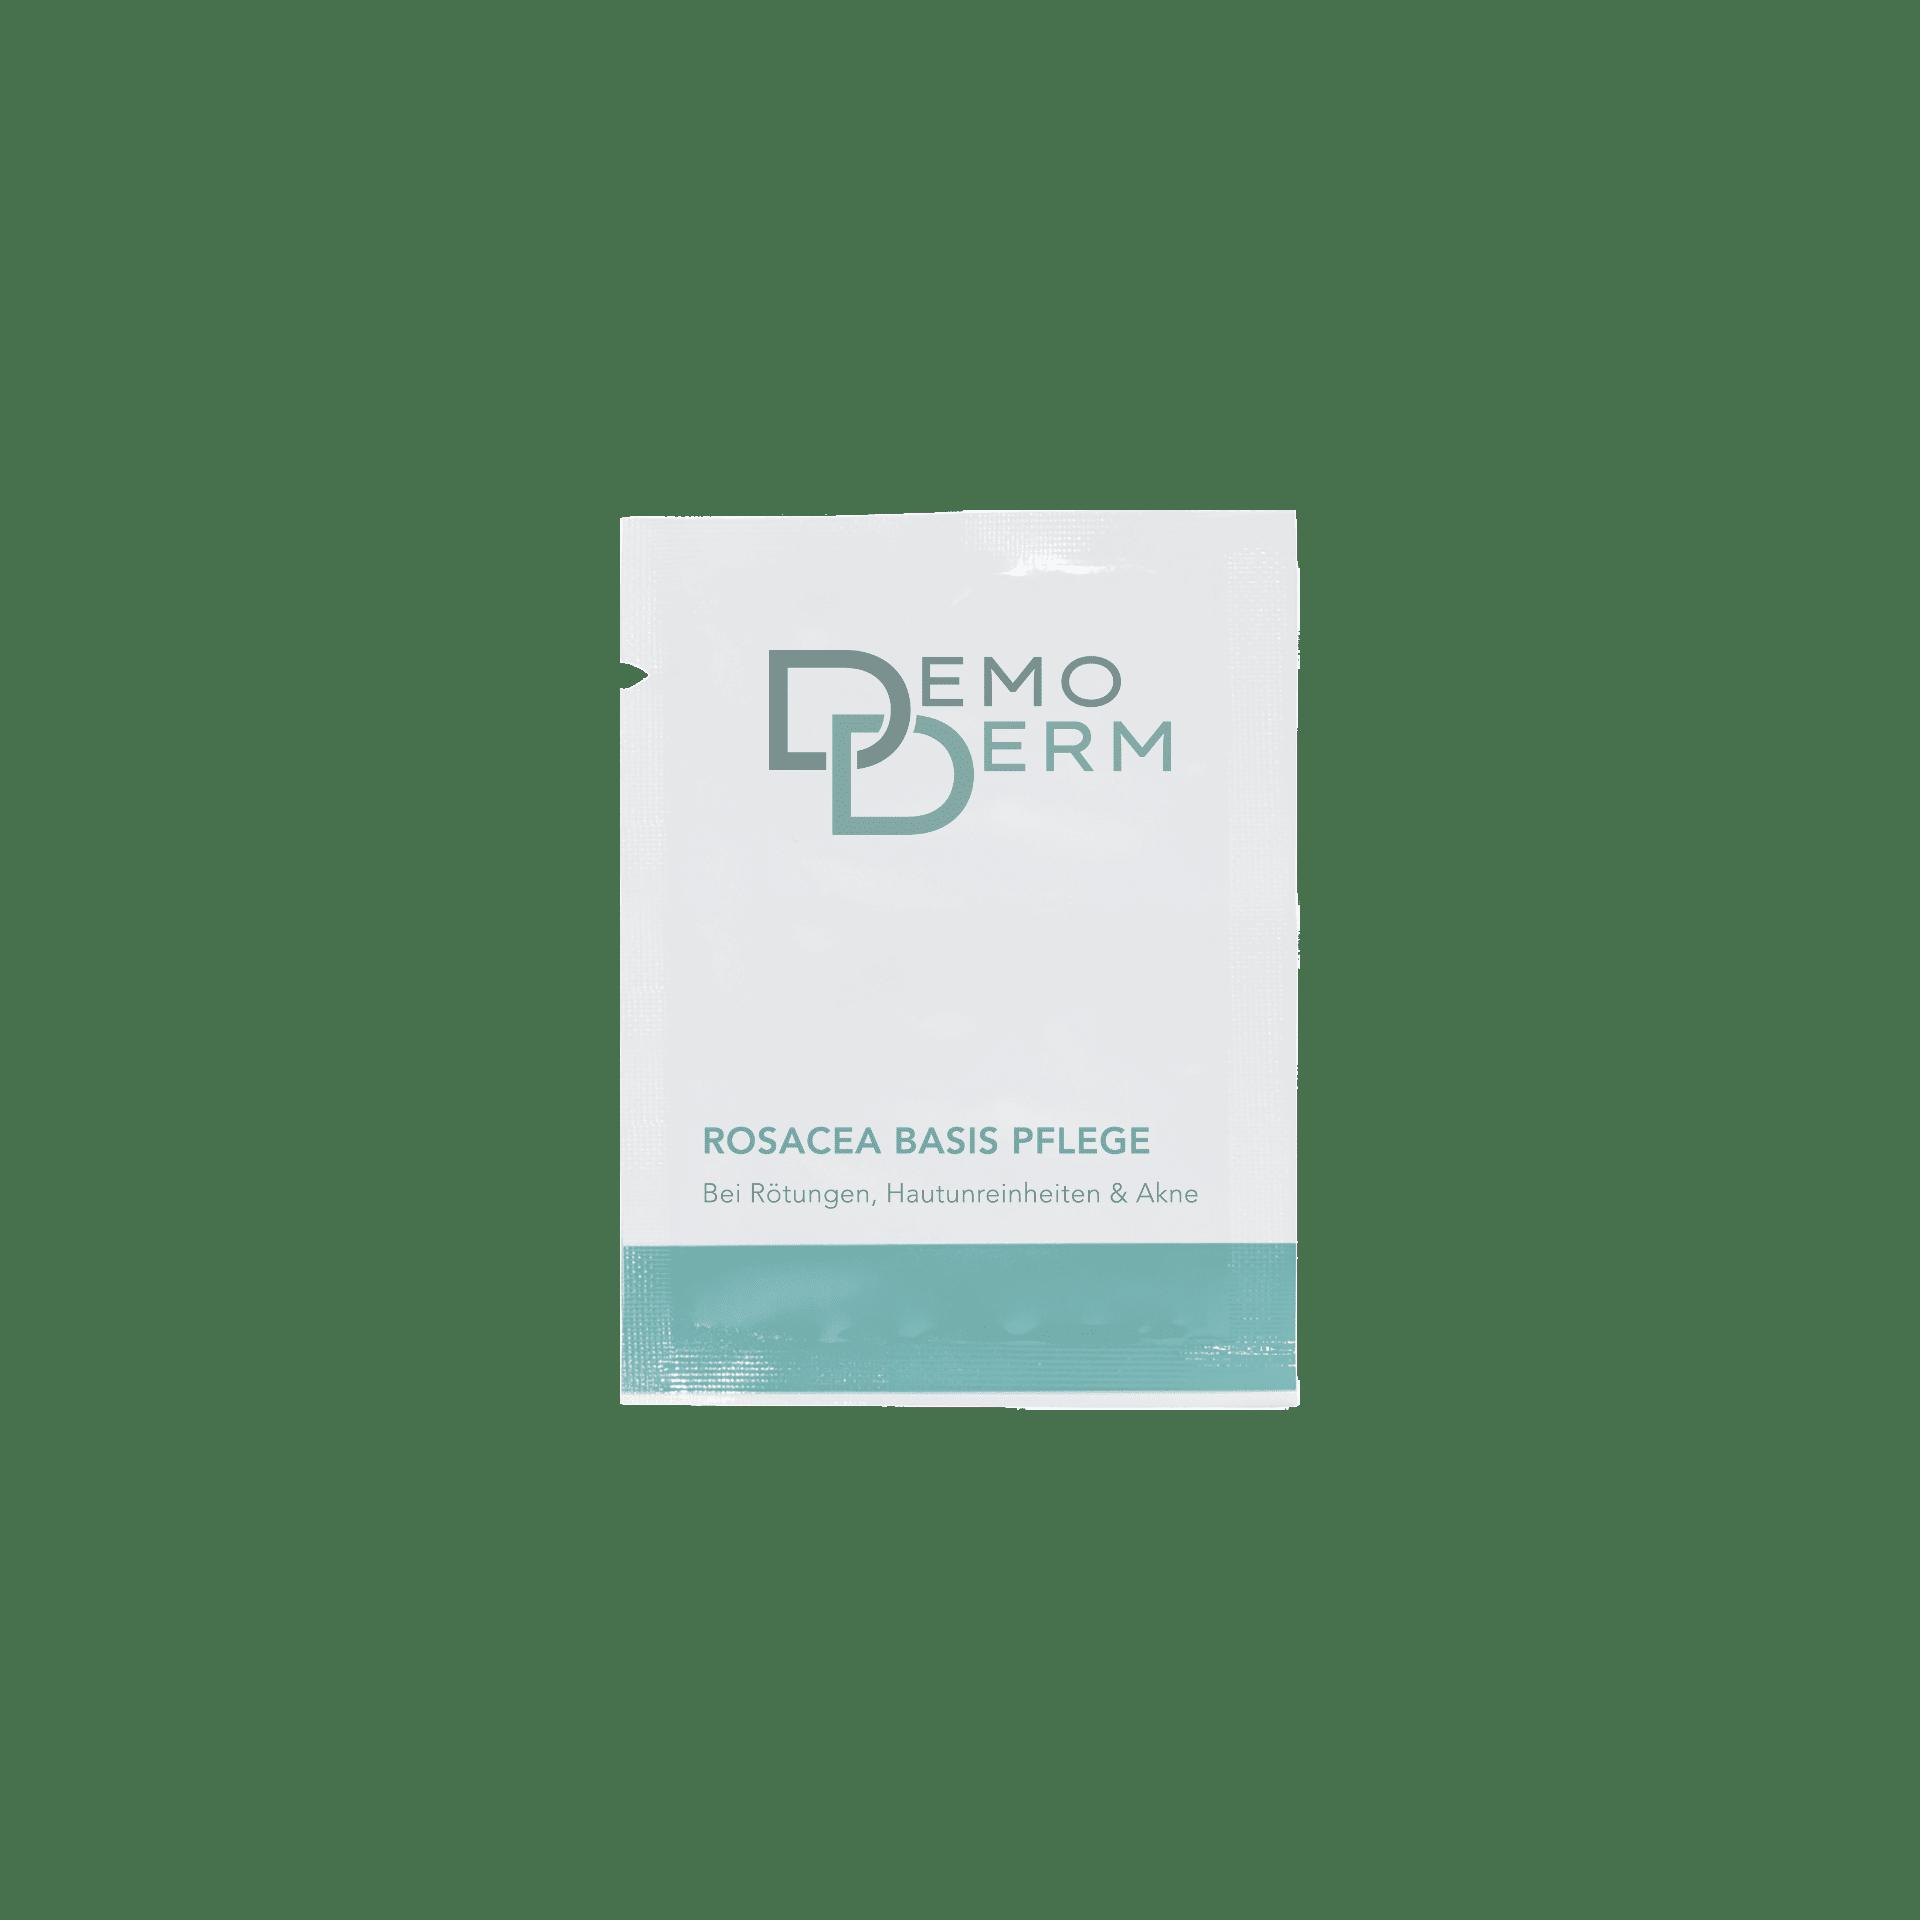 DemoDerm Rosacea Basis Pflege Probe